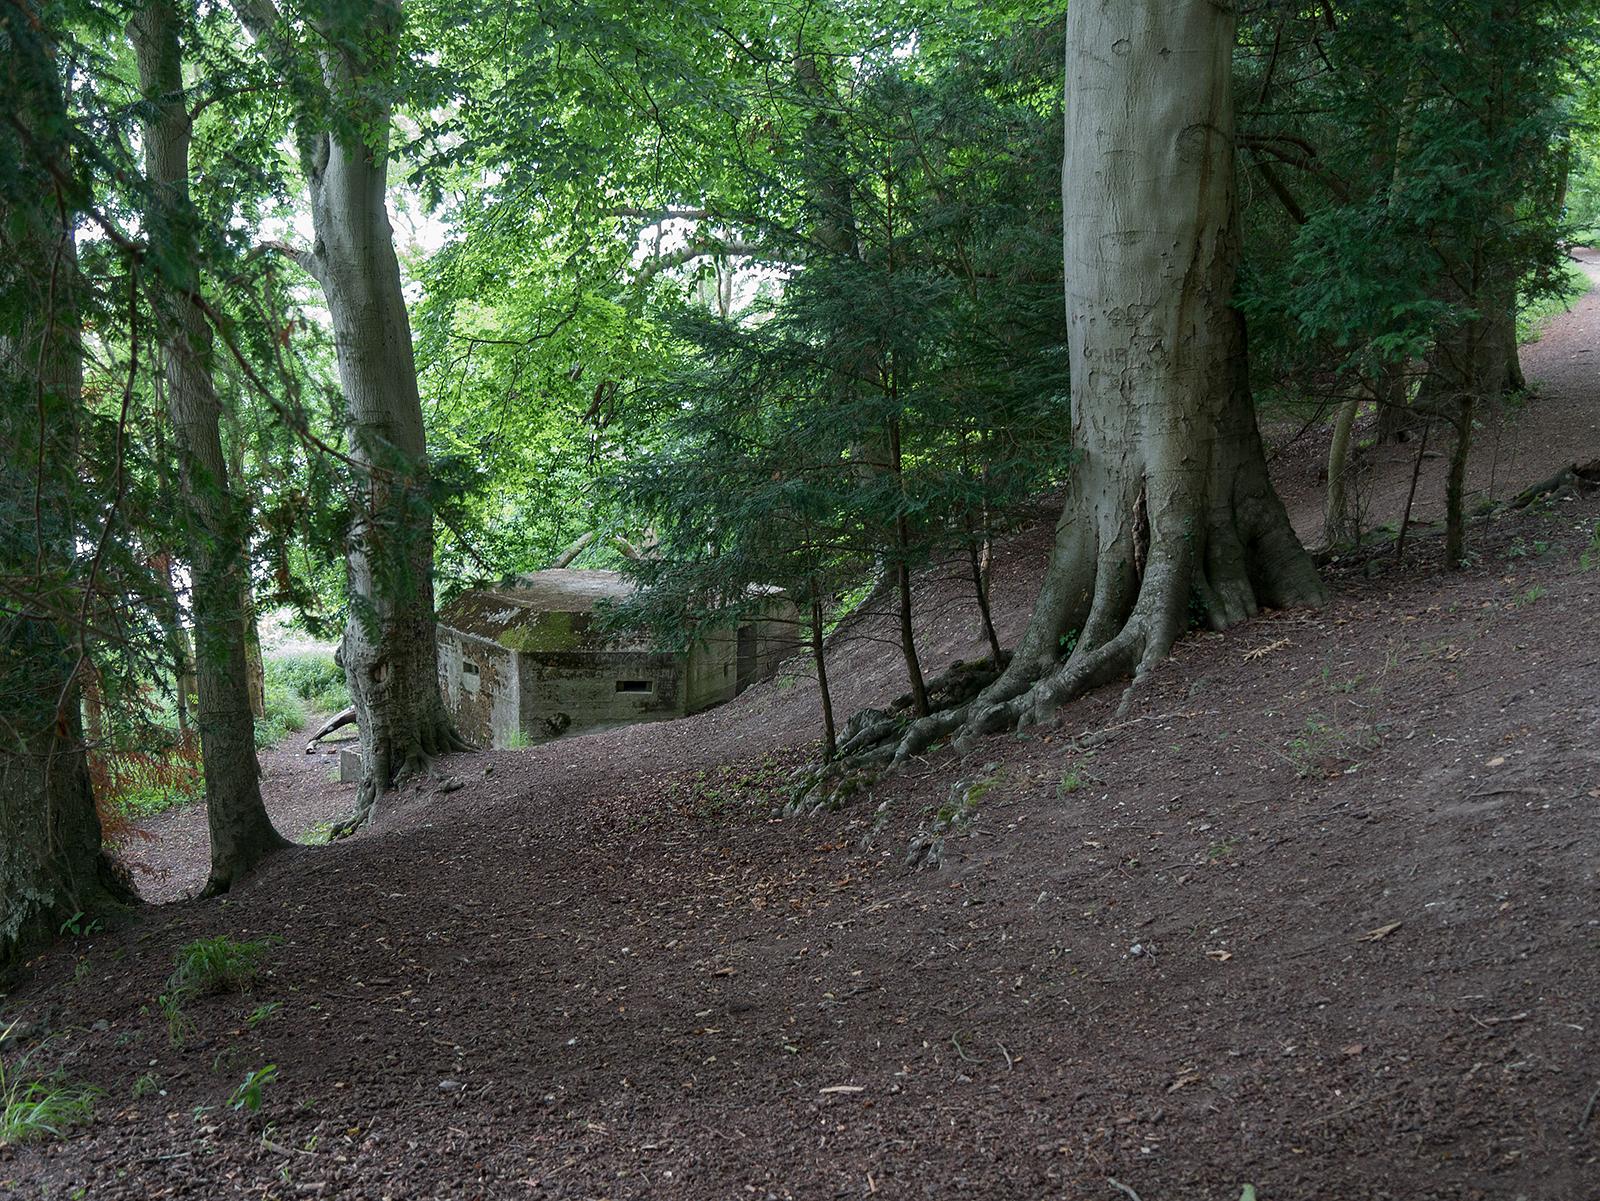 Emplacement in Hartslock Wood